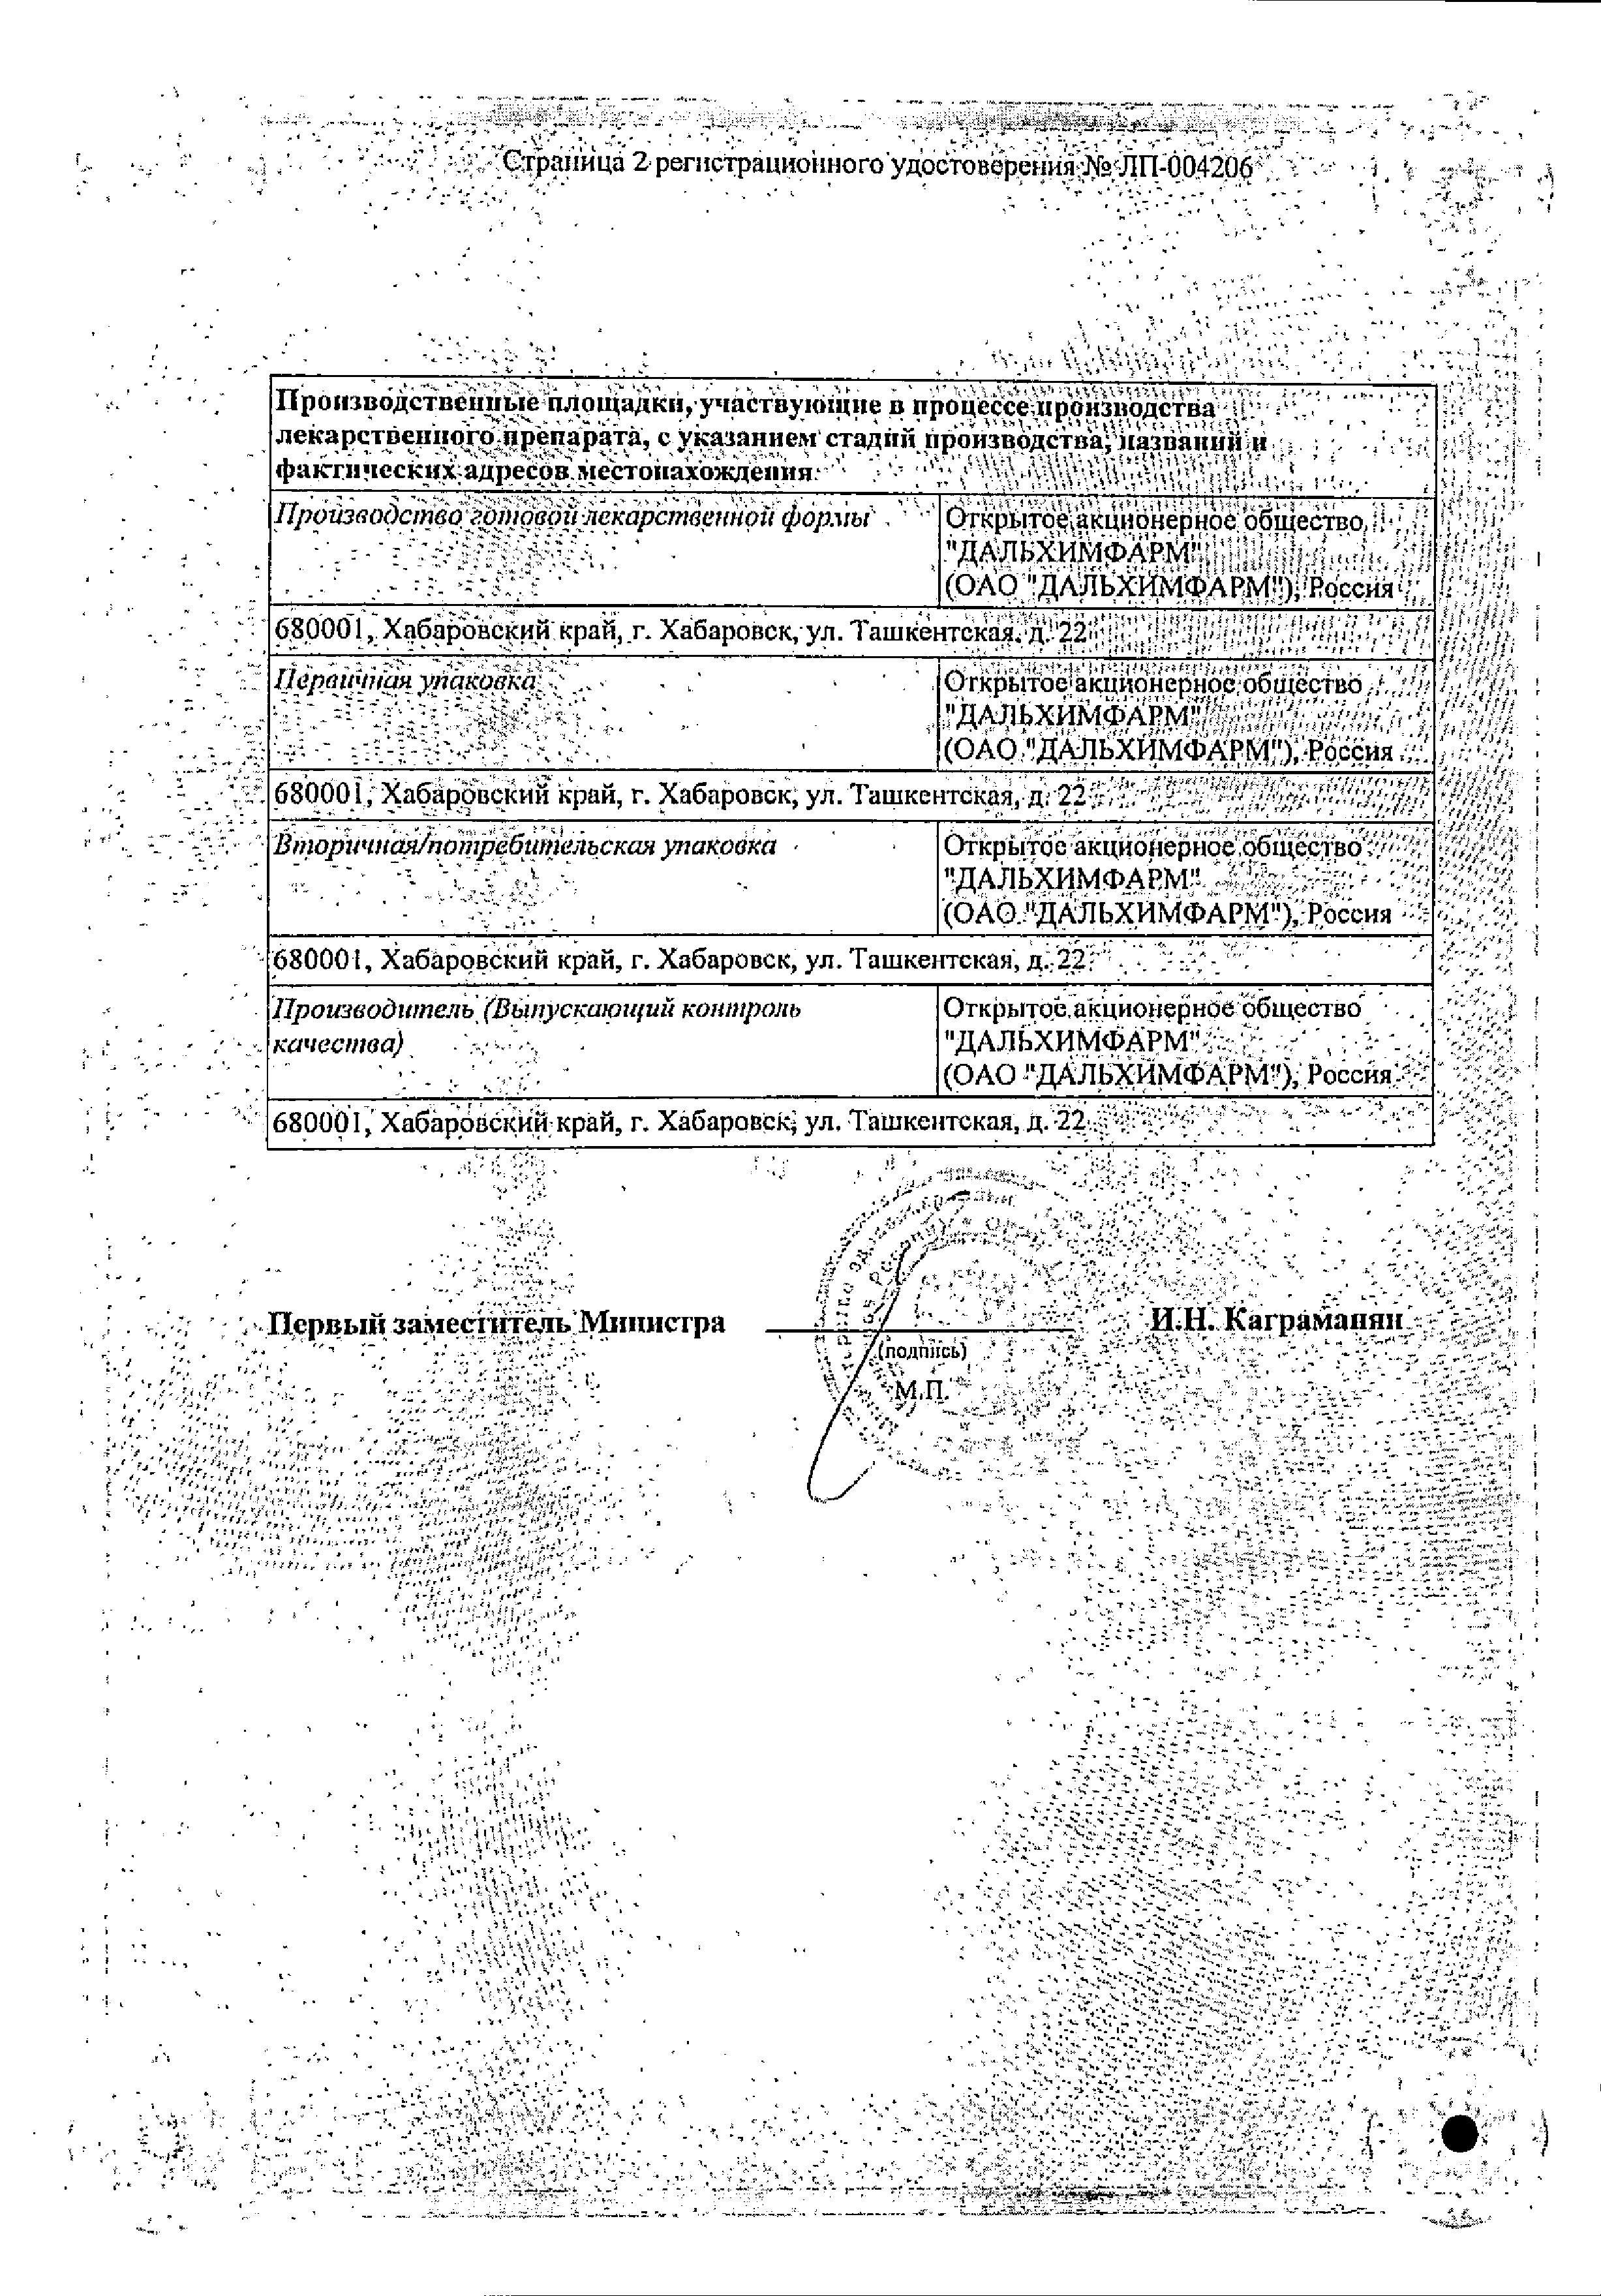 Мезатон сертификат